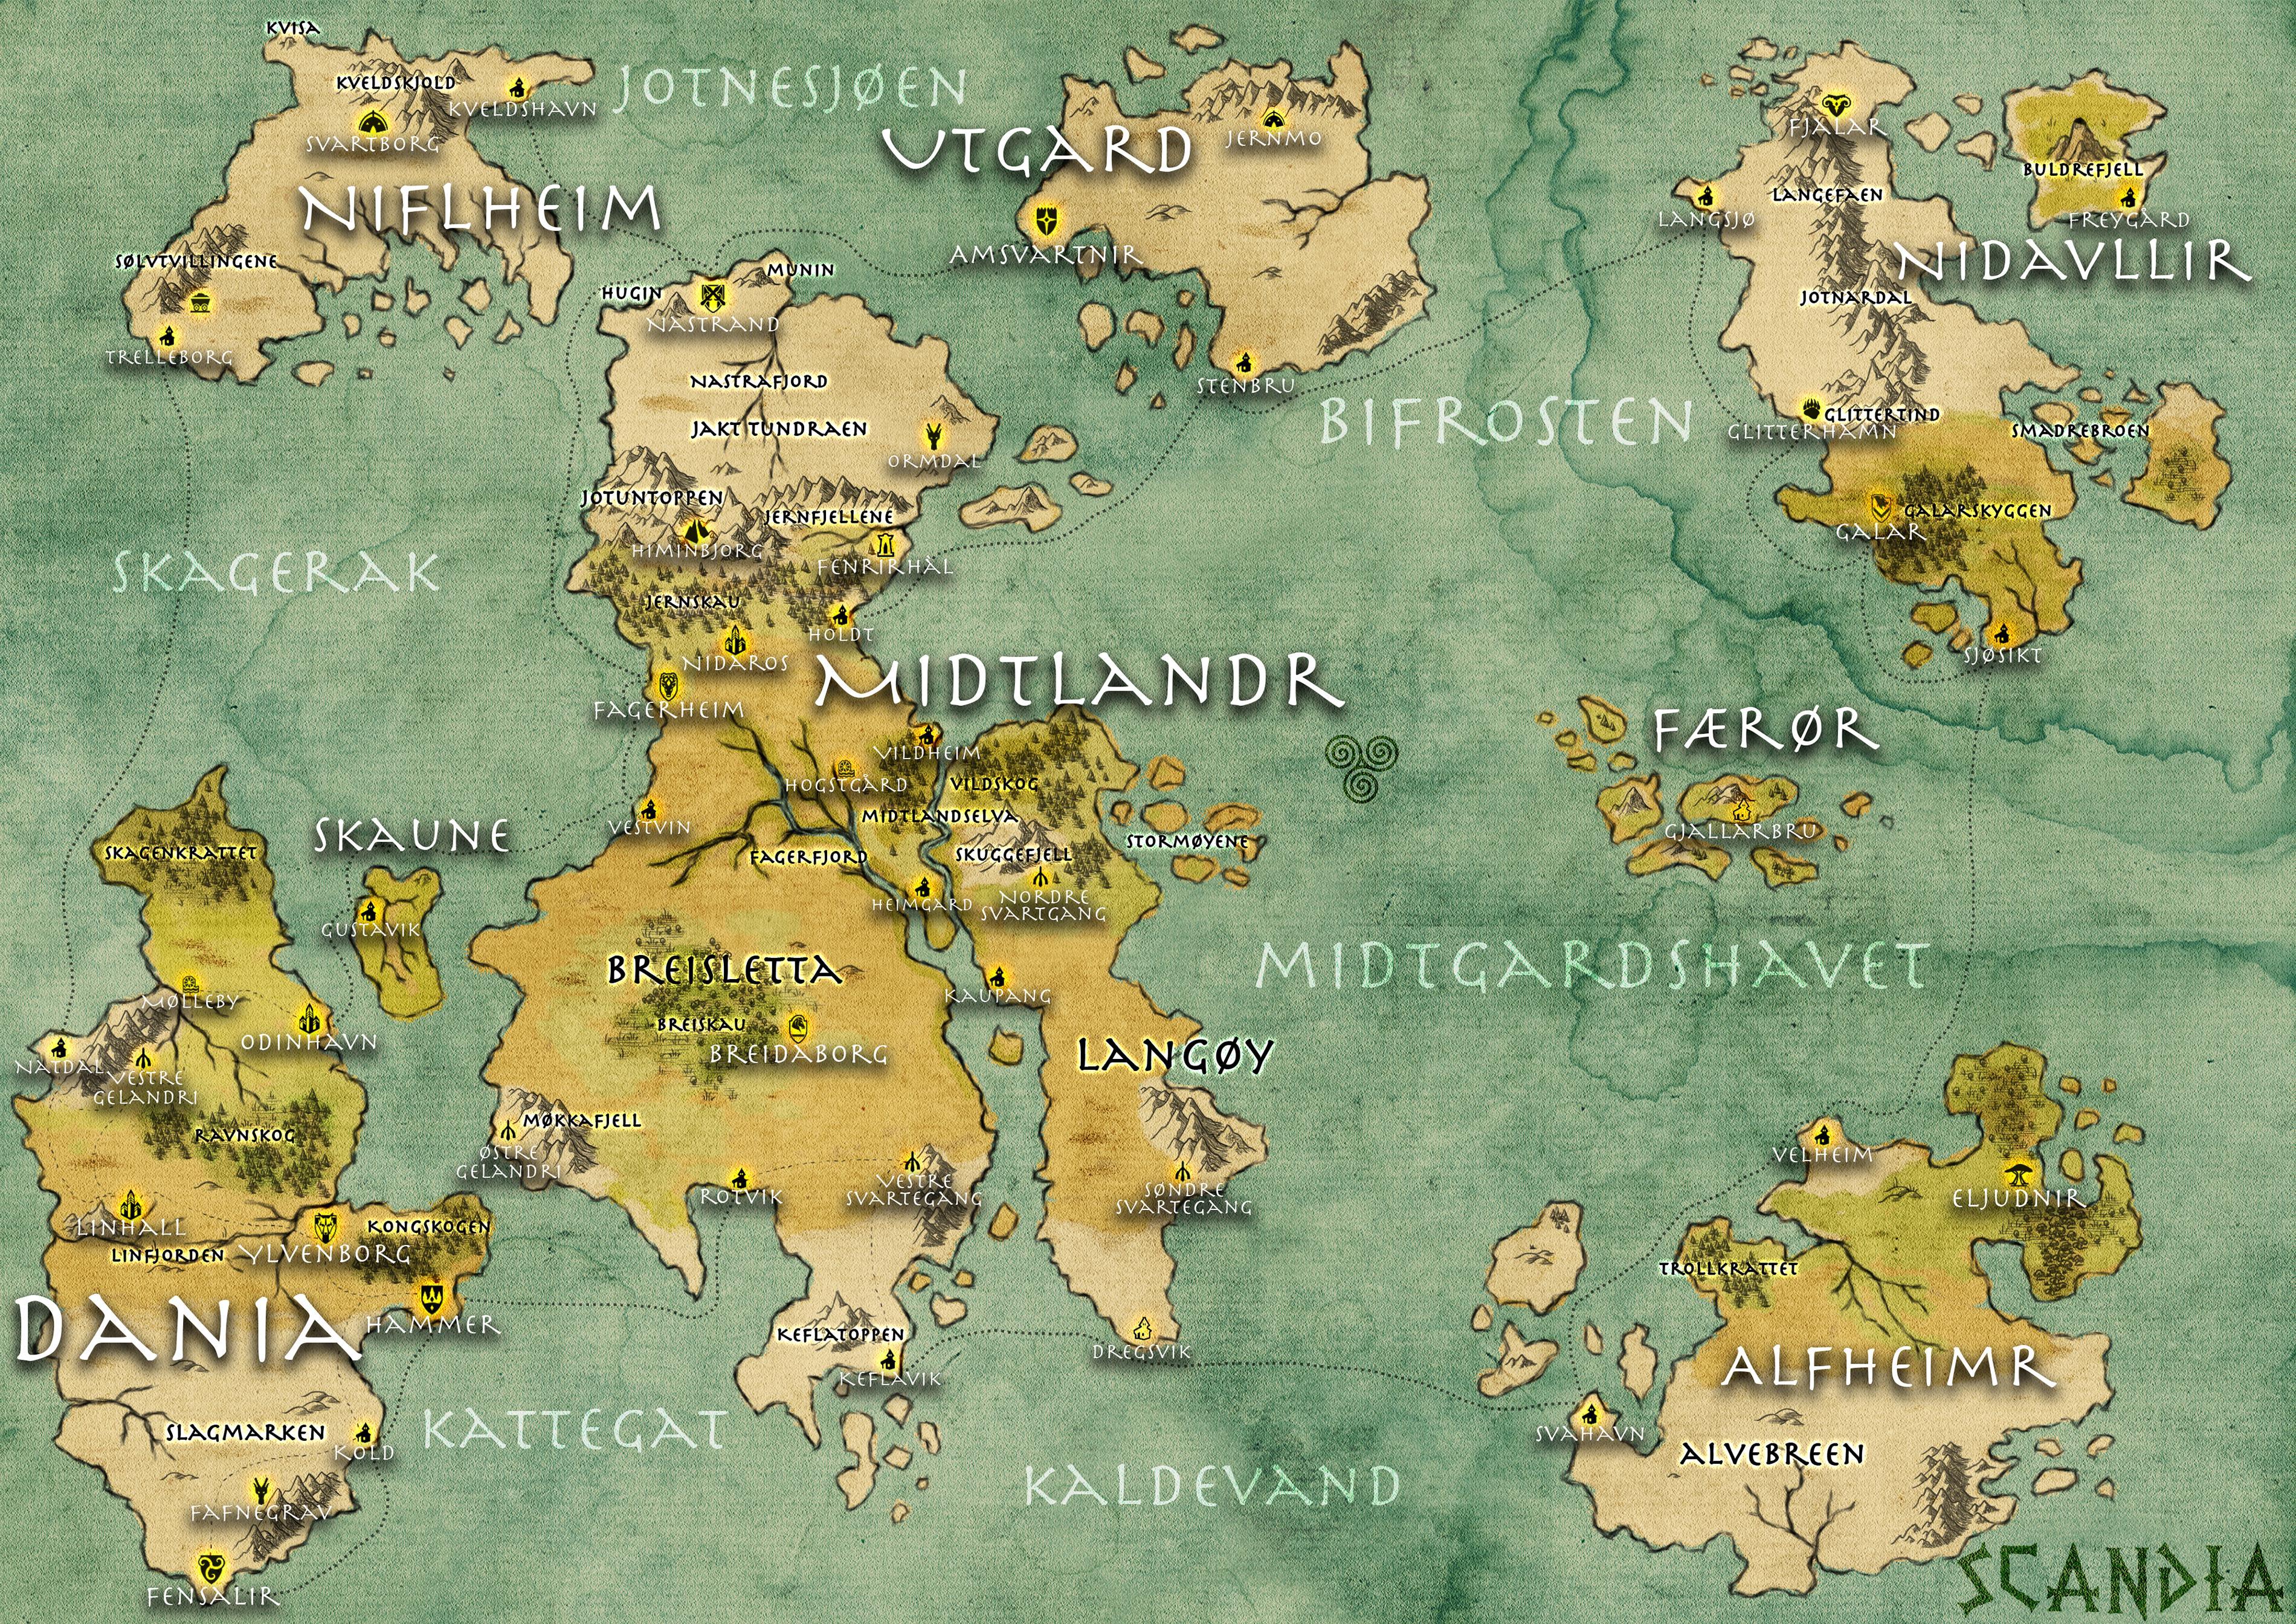 scandia made a map